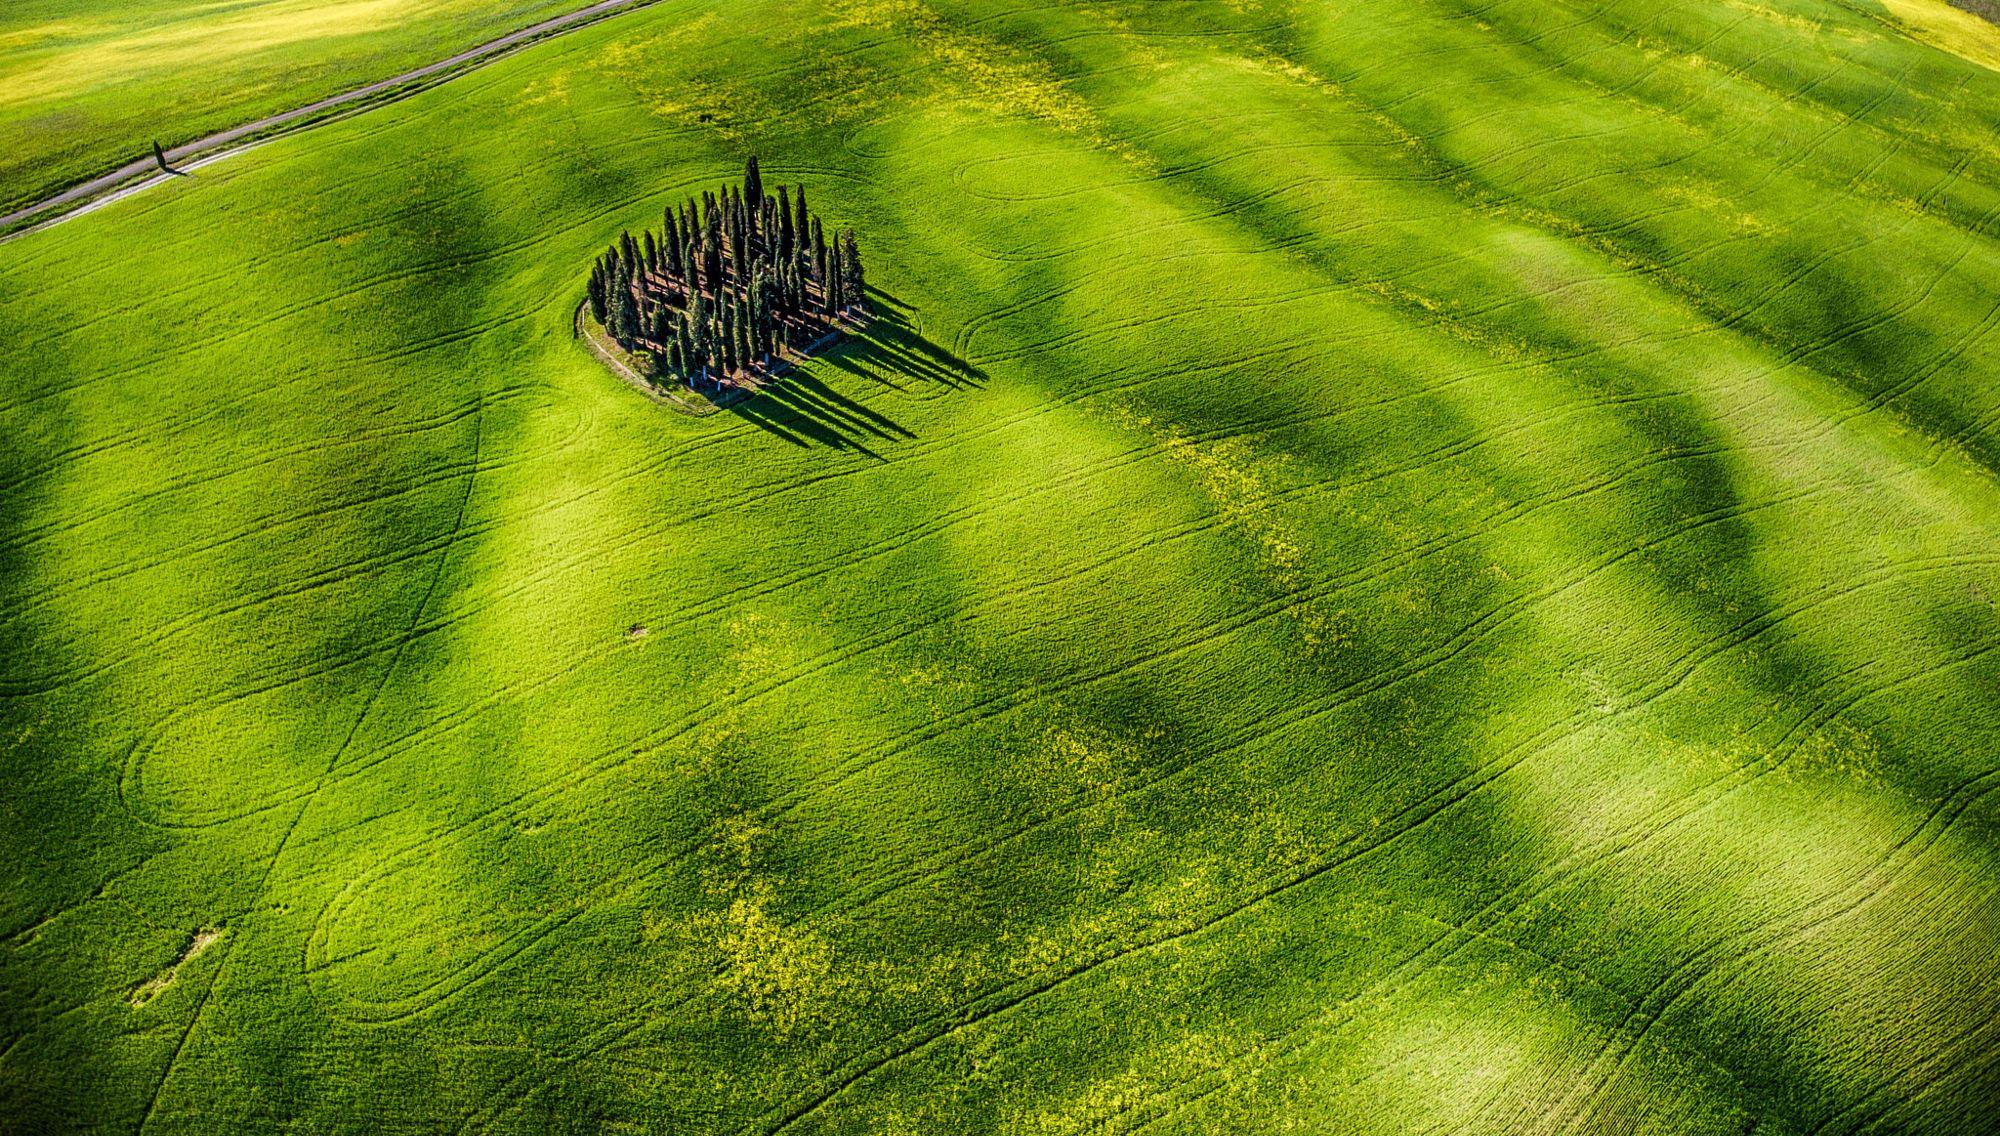 G R E E N A grass in Tuscany. Green grass I think.